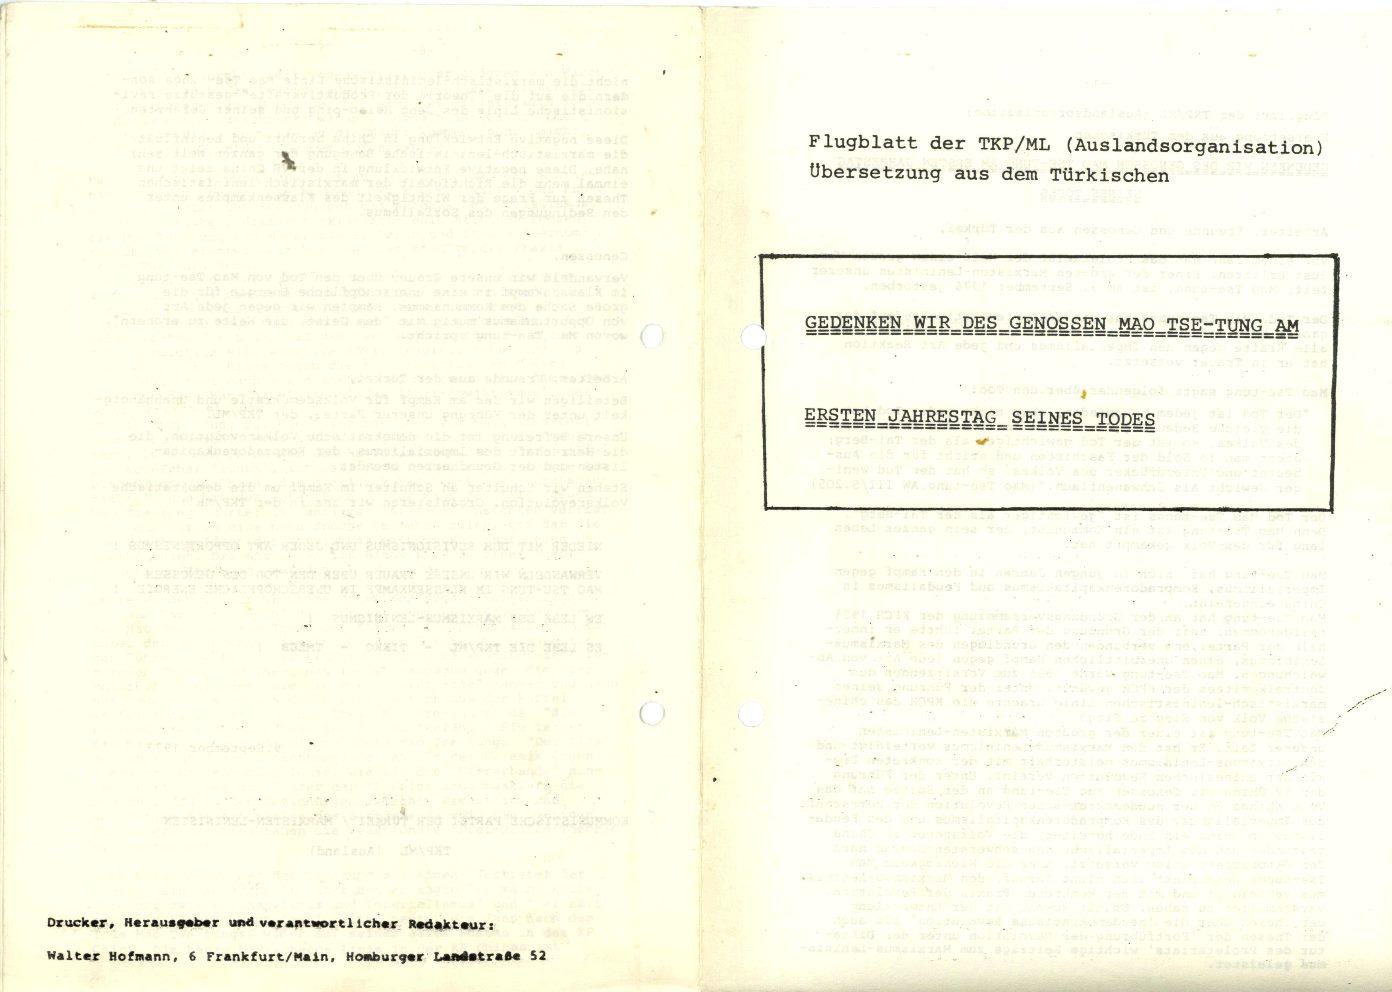 TKPML_1977_04_01